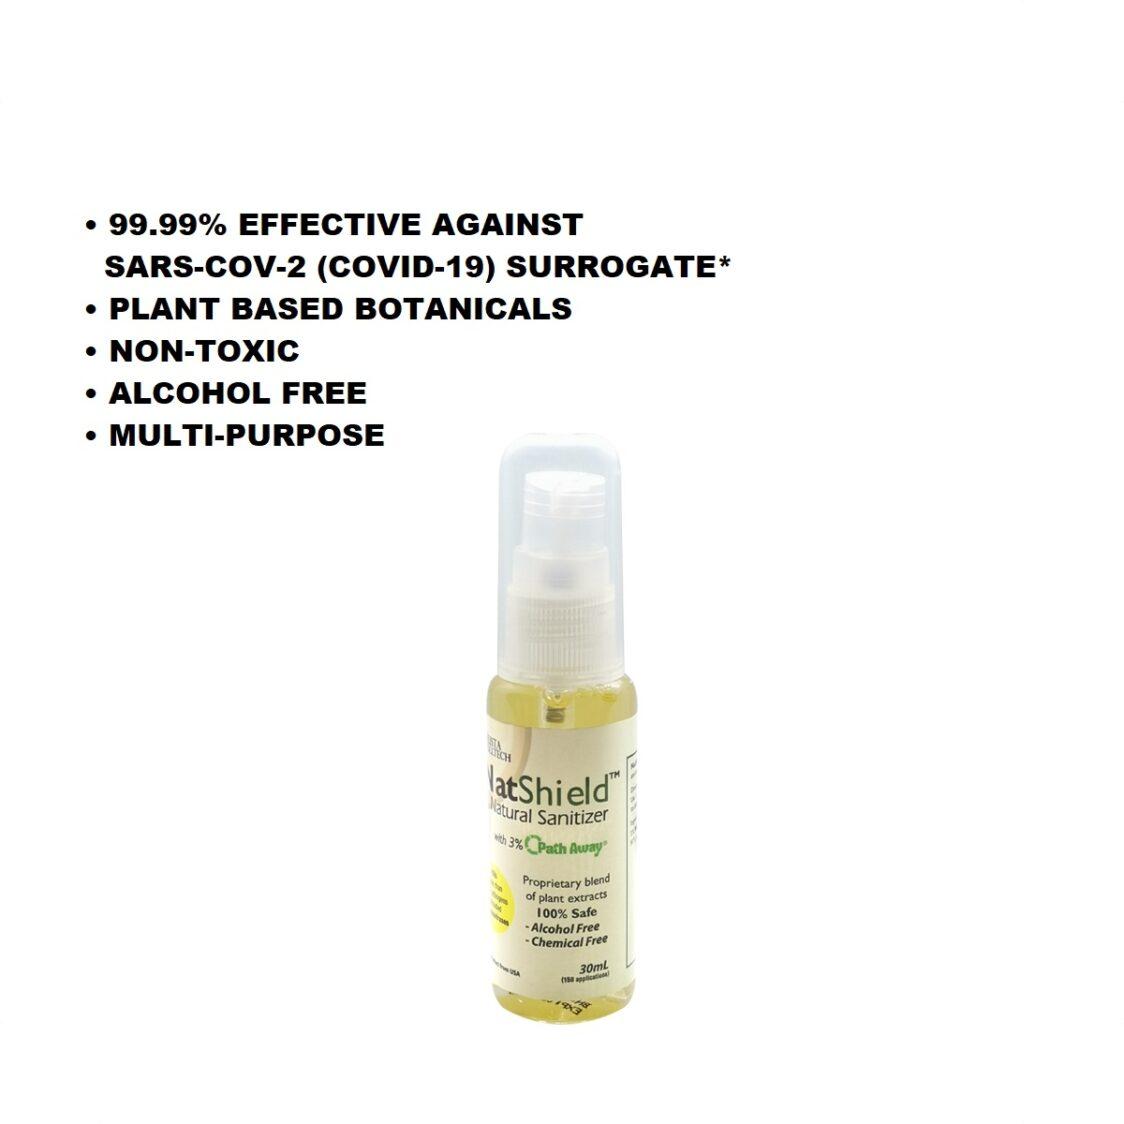 NatShield Natural Sanitizer with Path-Away 30ml